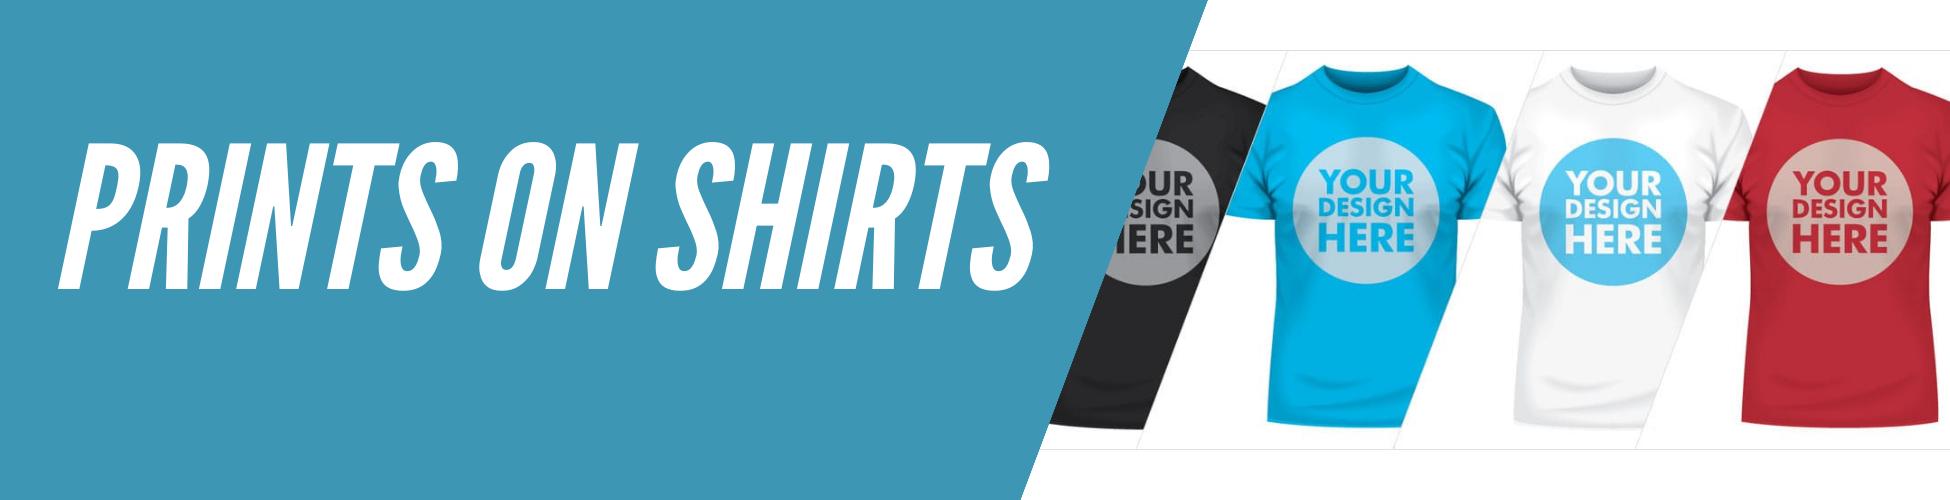 prints-on-shirts-banner-v2.png